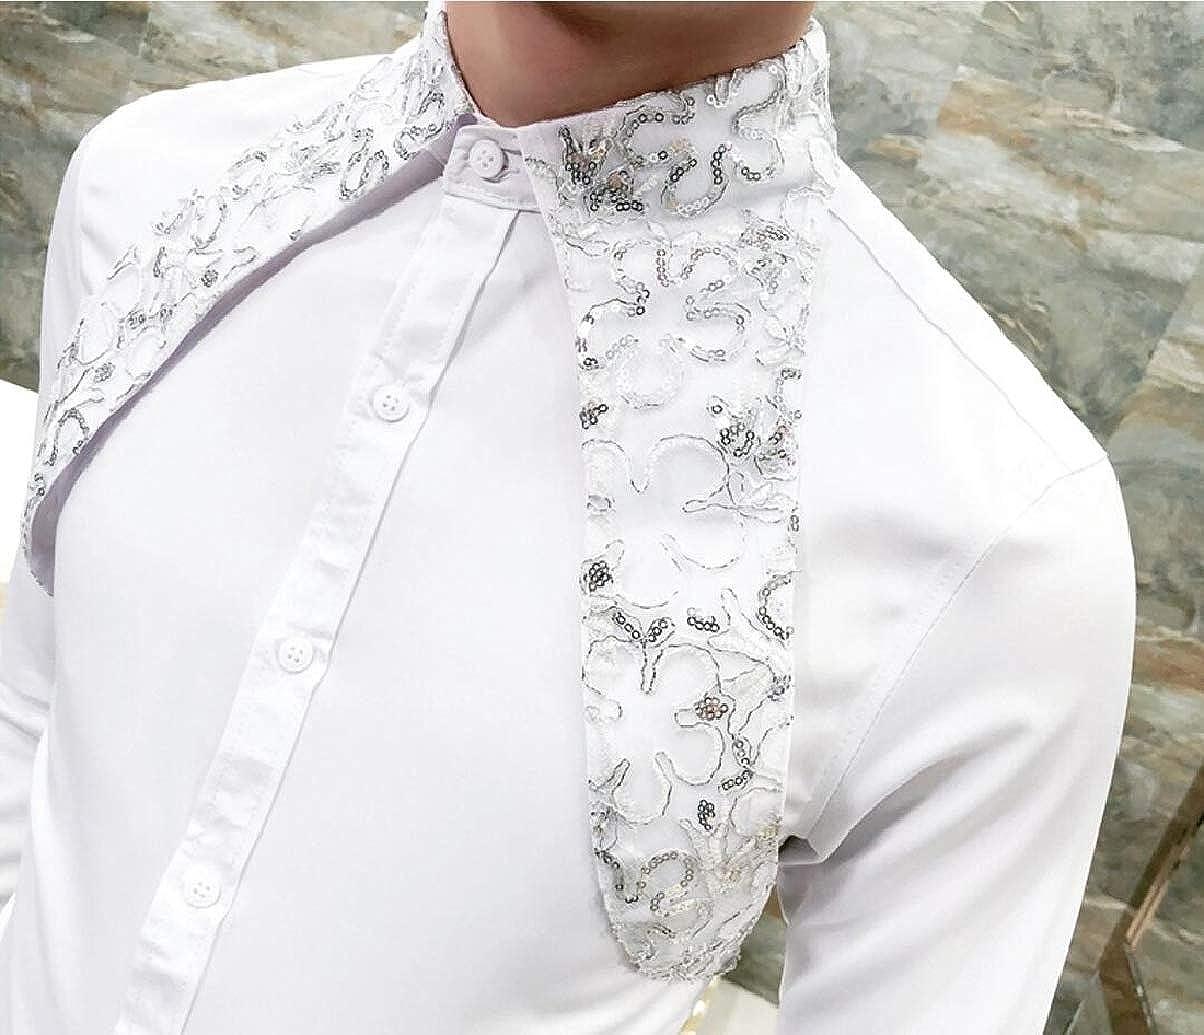 ZXFHZS Mens Long Sleeve Sequins Shirt Dance Prom Party Button Down Fashion Shirt